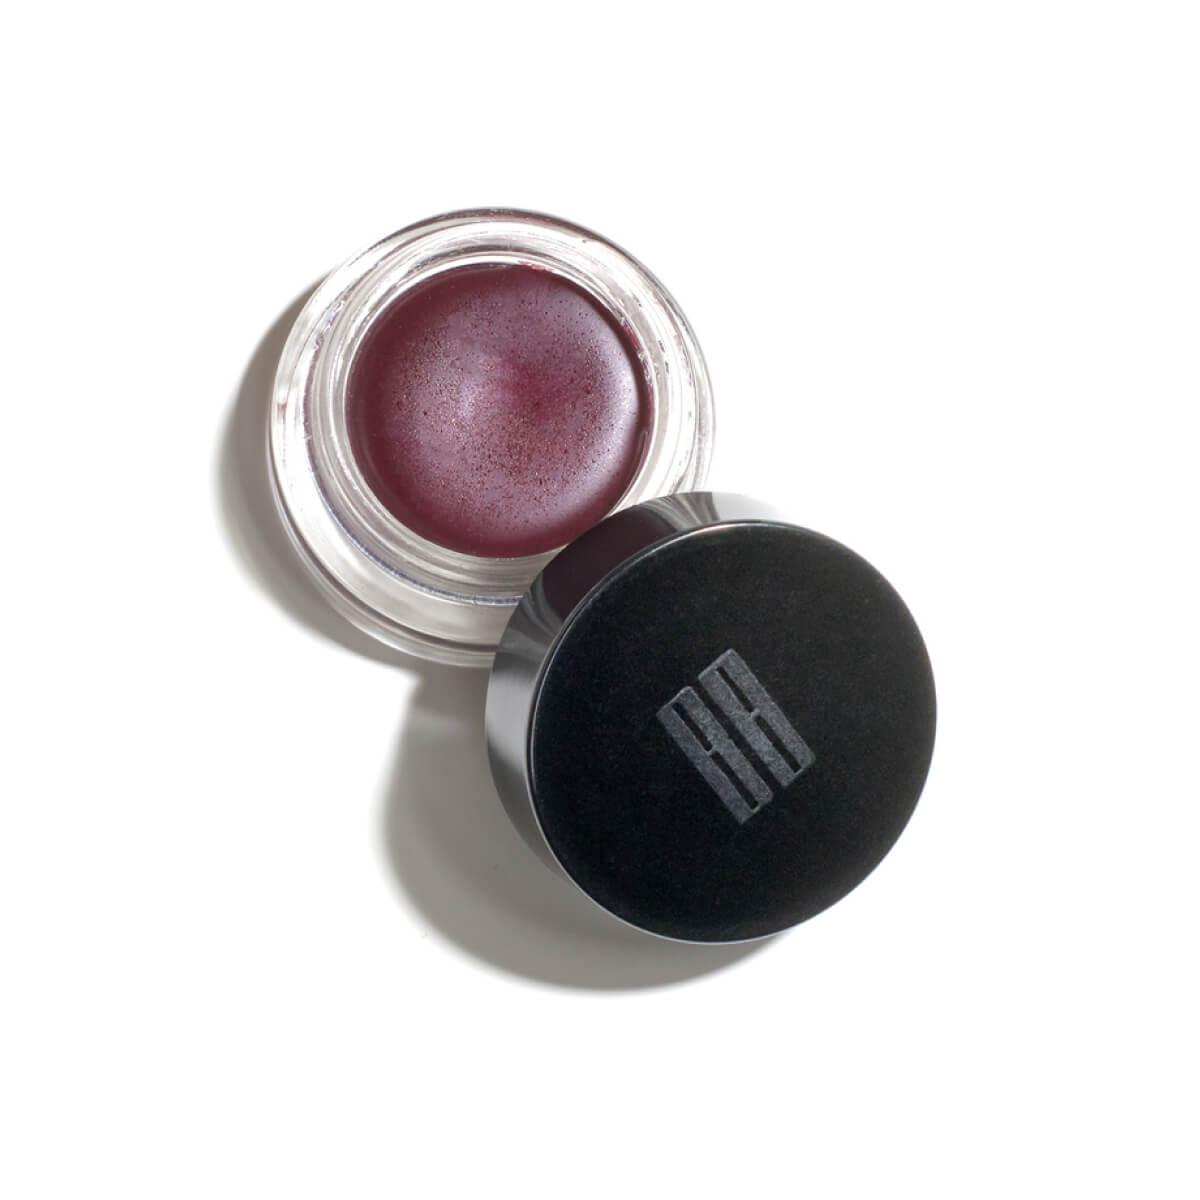 Balmyard Beauty Baby Love Balm Lip + Cheek Tint in Black Roses